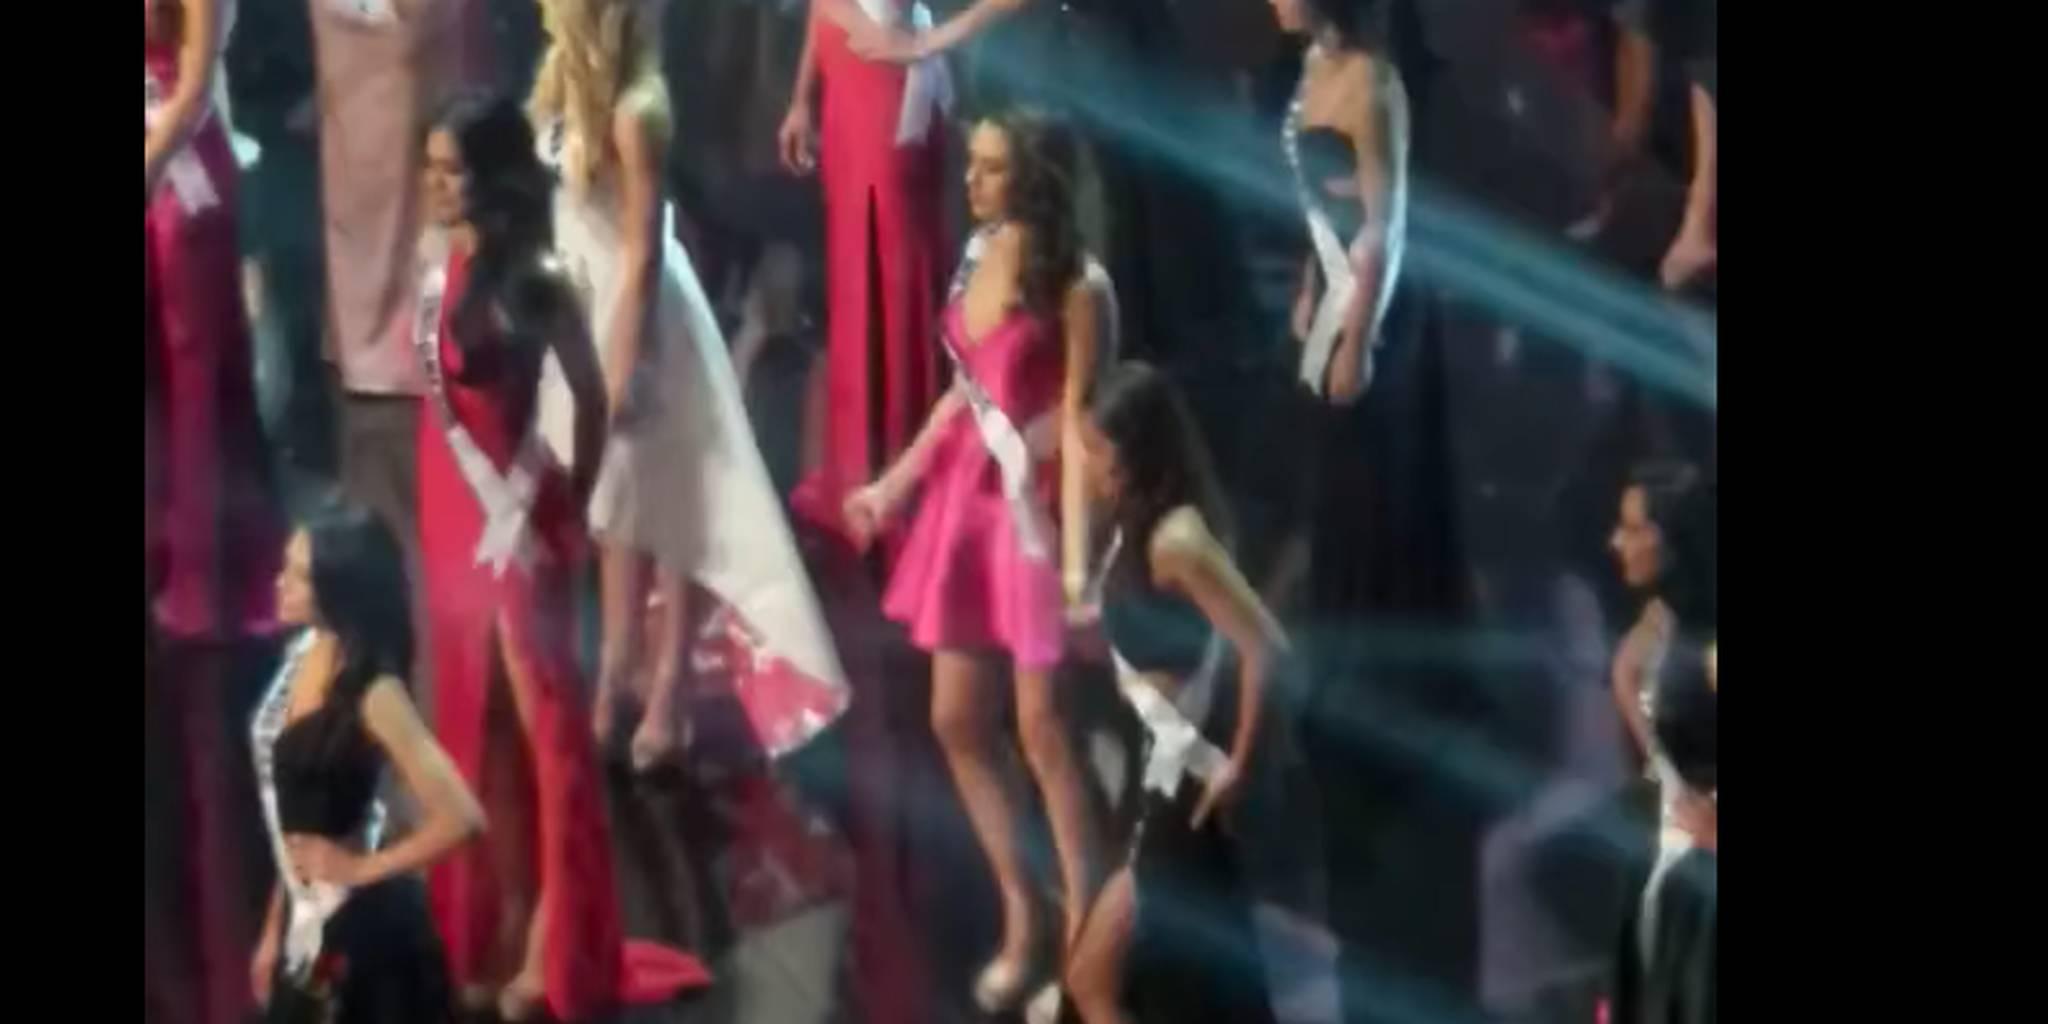 Miss Netherlands' 'Single Ladies' dance during Miss Universe break goes viral